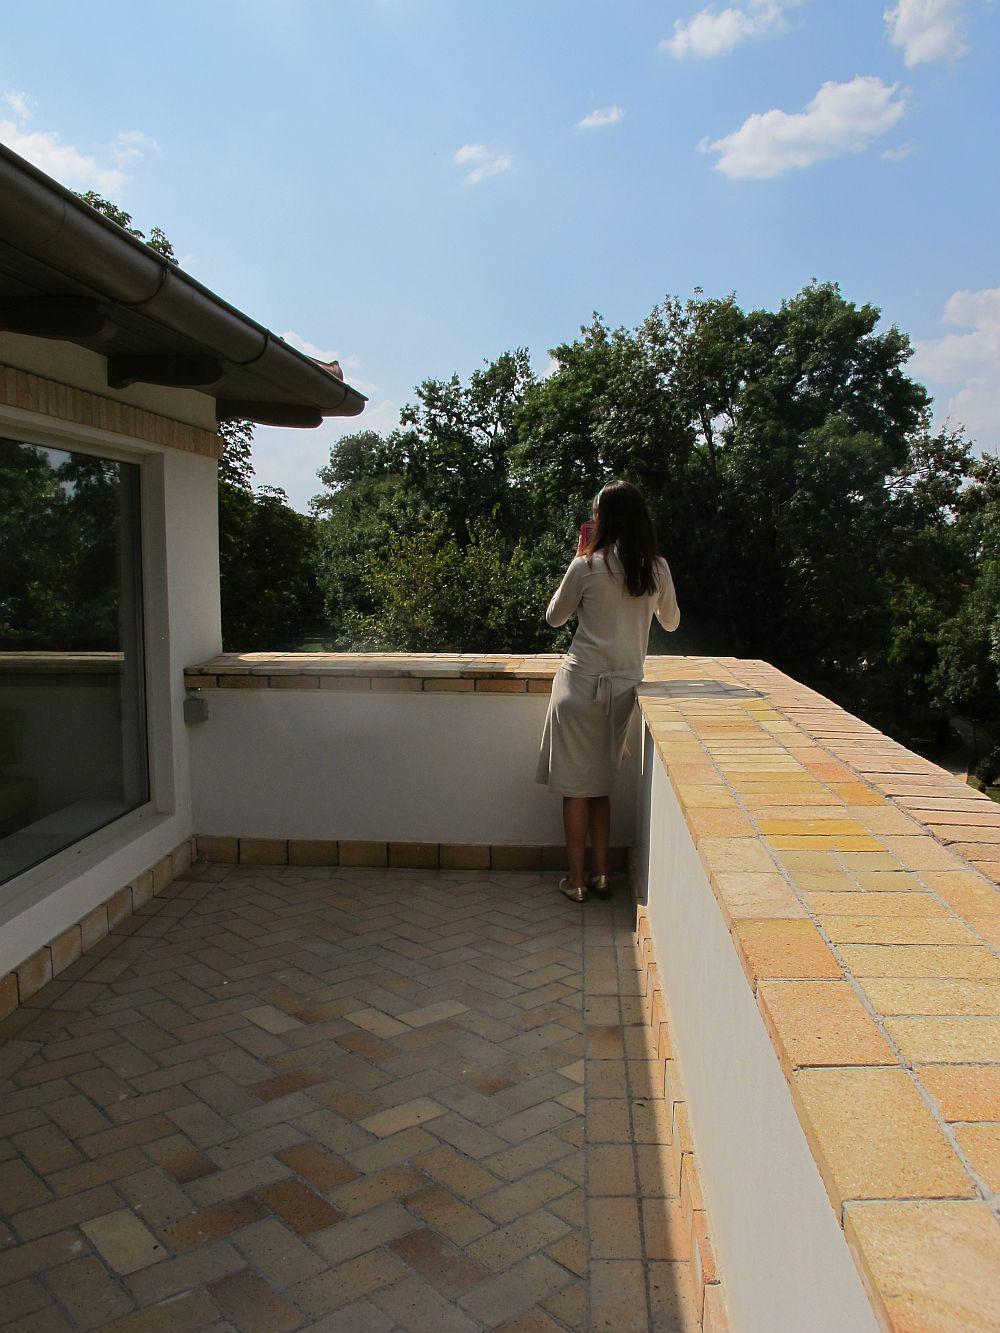 adelaparvu.com despre Domeniu Manasia, Urziceni, Romania (22)